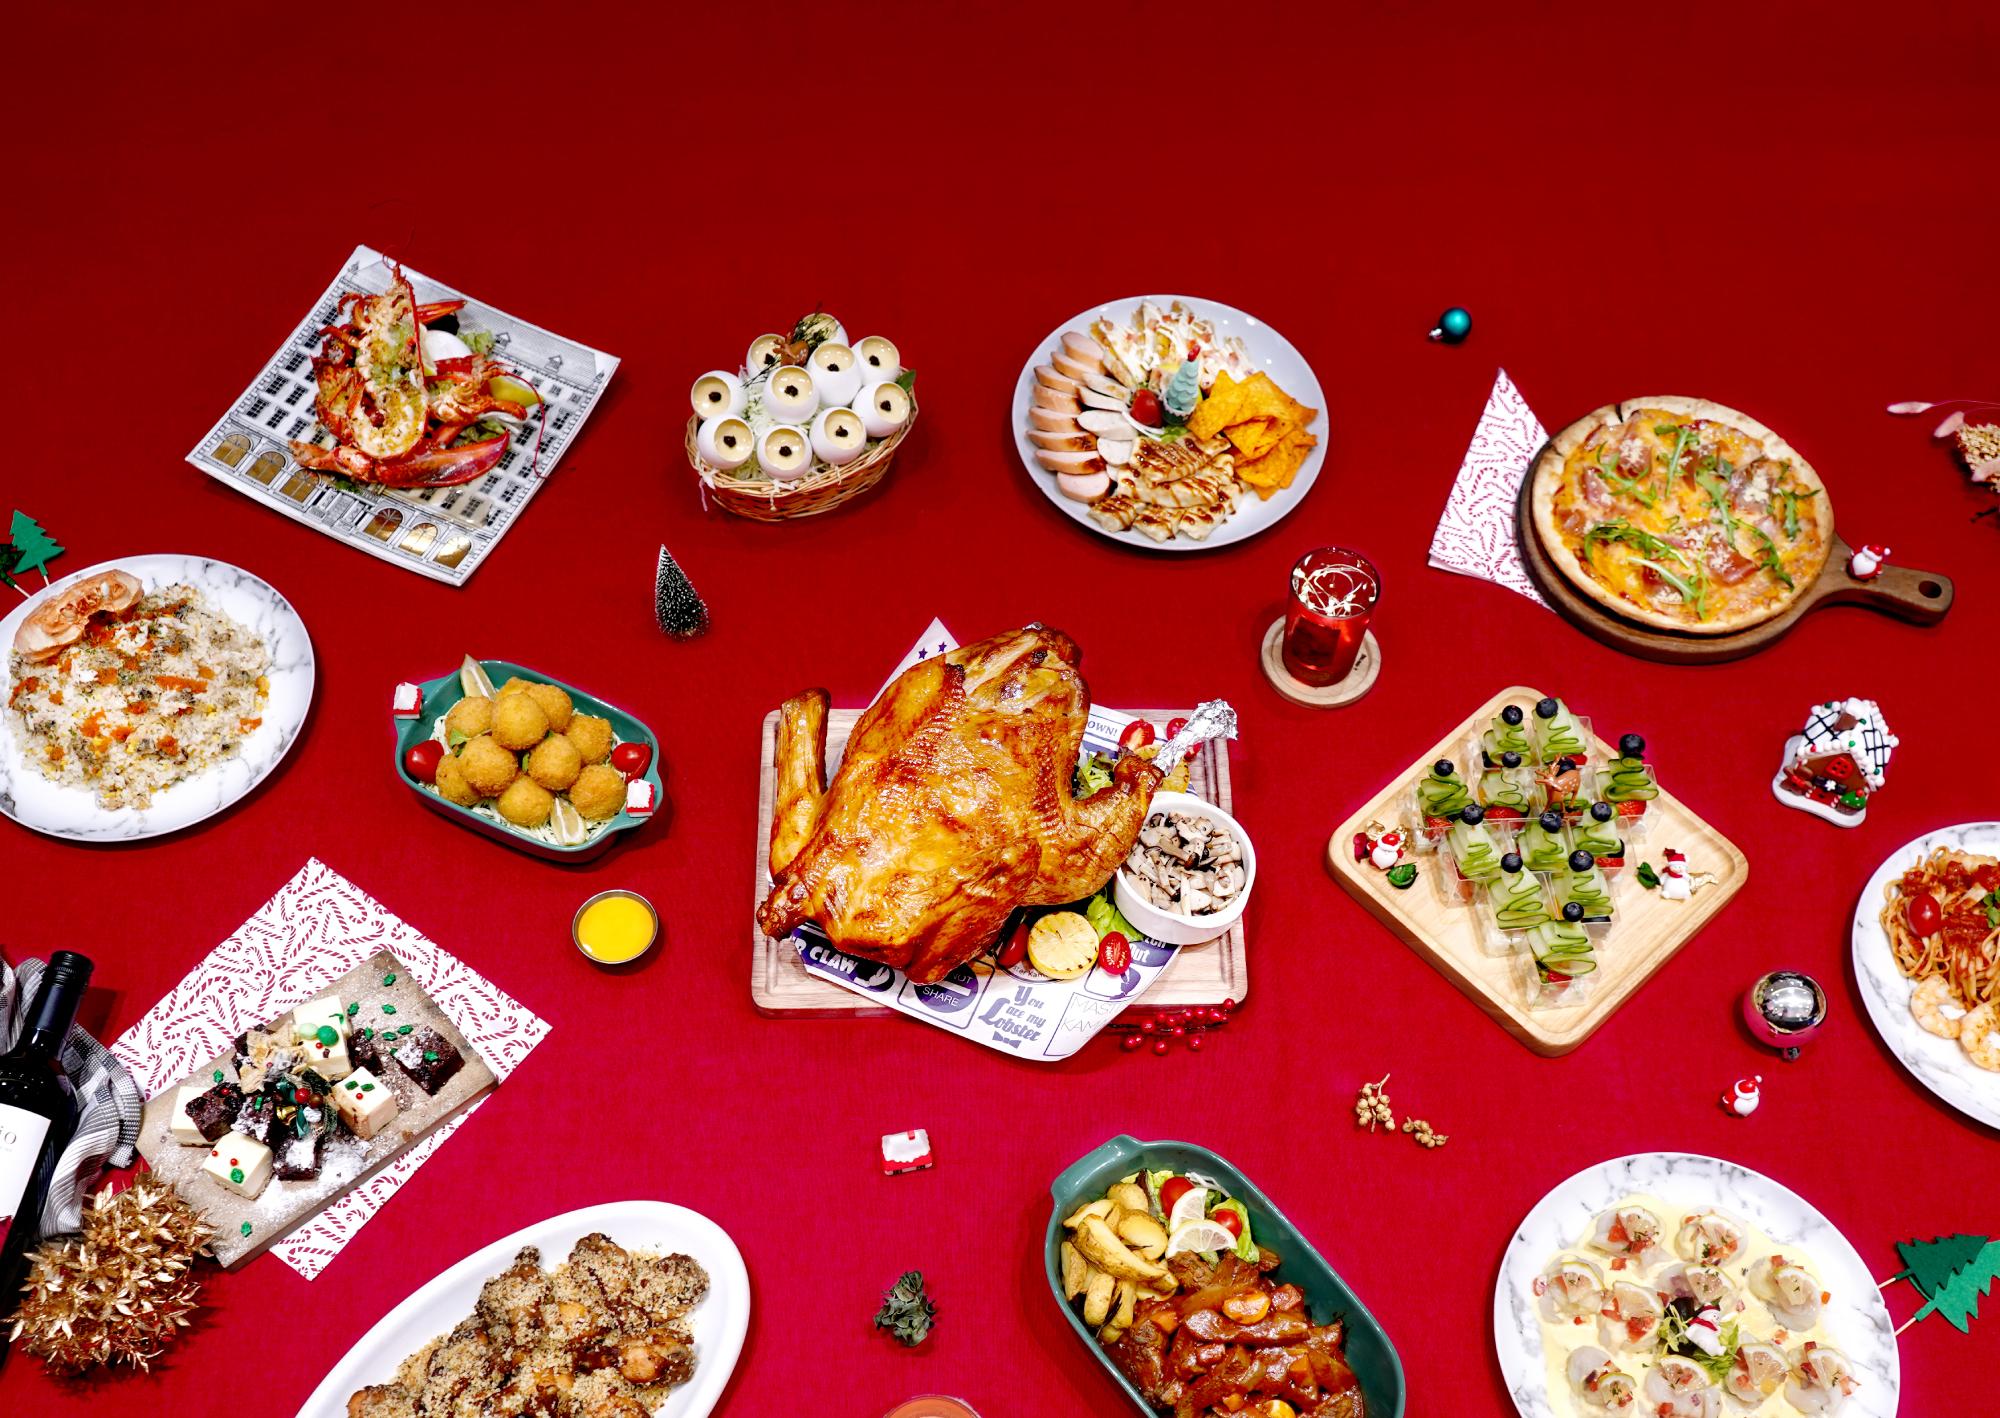 聖誕大餐外賣推介2020|Christams Catering Delivery|聖誕節限定外賣美食|Kamadelivery聖誕餐飲服務全香港直送